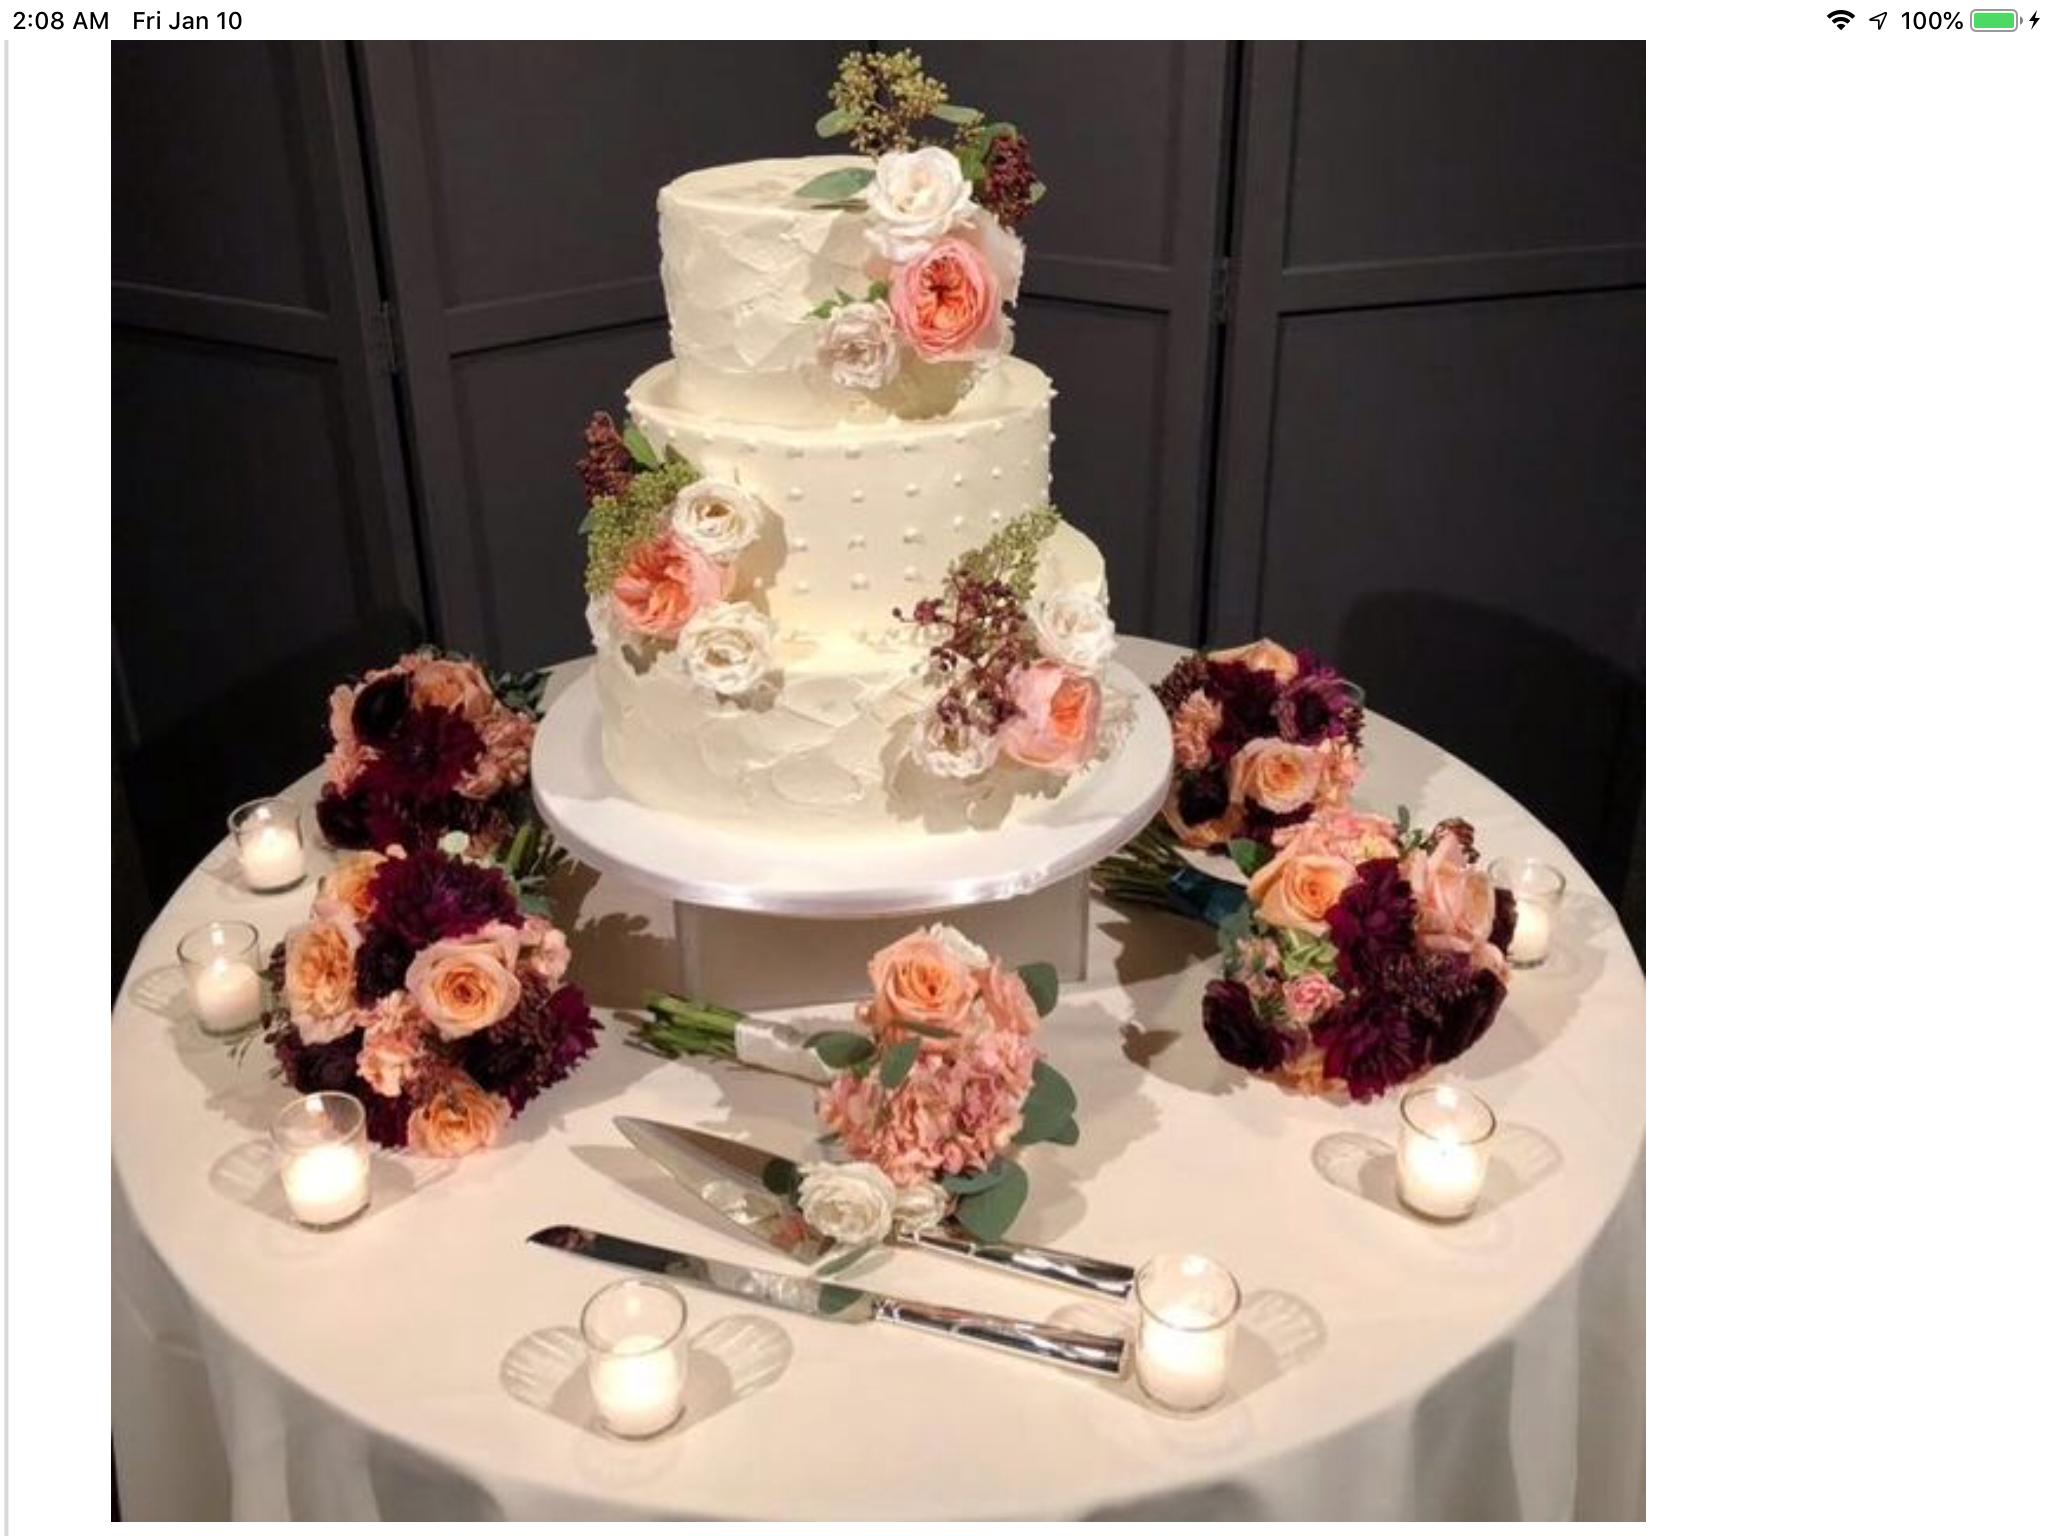 Pin By Roberta Murphy On Wedding In 2020